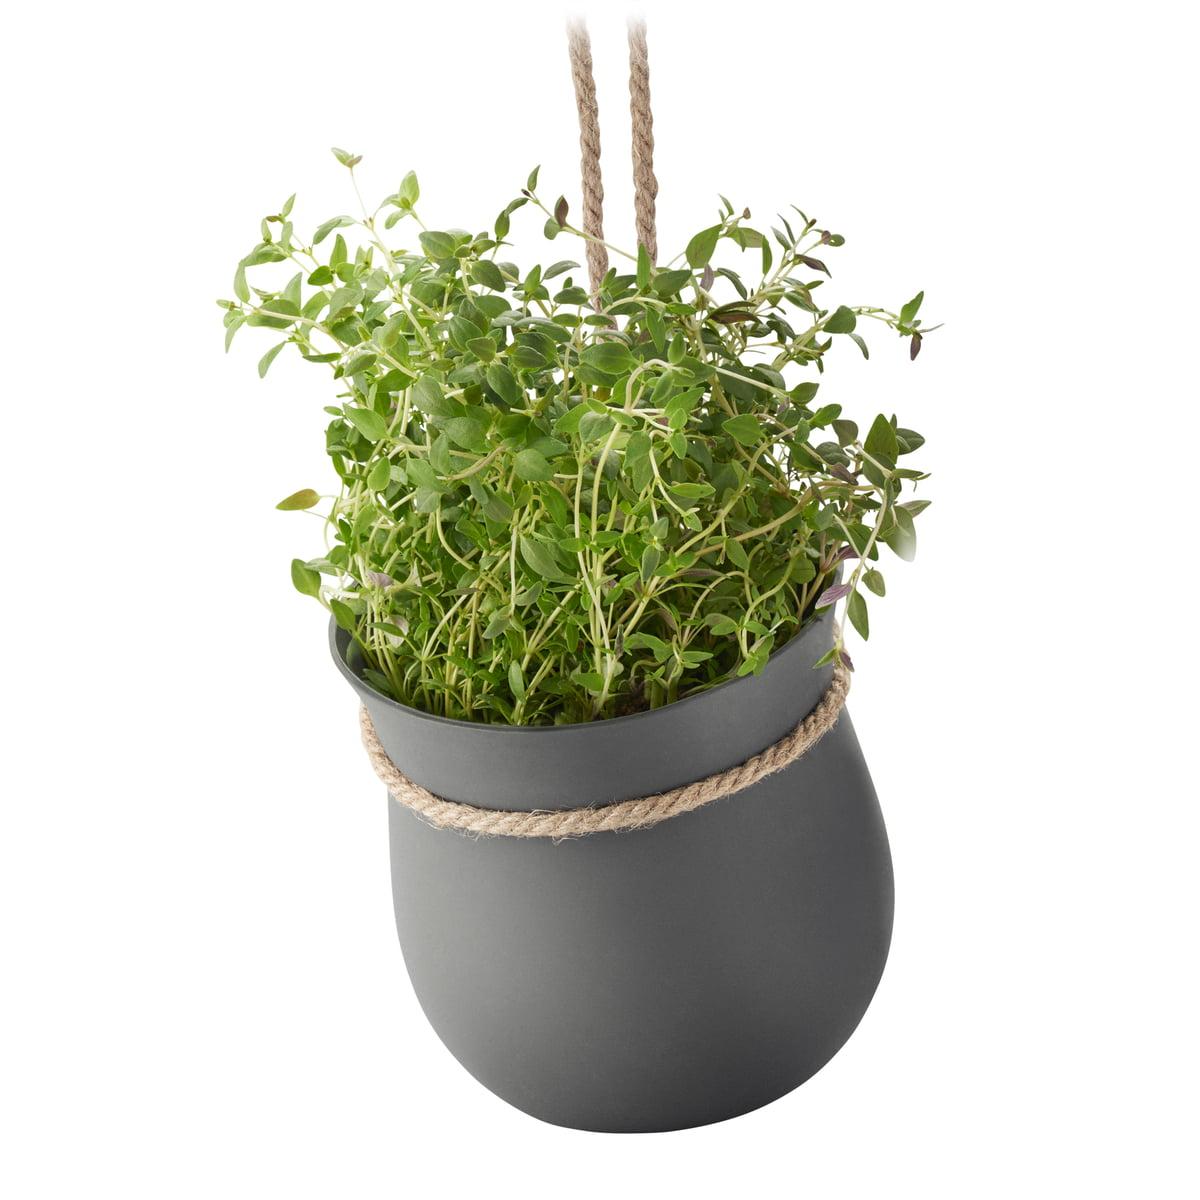 grow it kr utertopf von rig tig by stelton. Black Bedroom Furniture Sets. Home Design Ideas